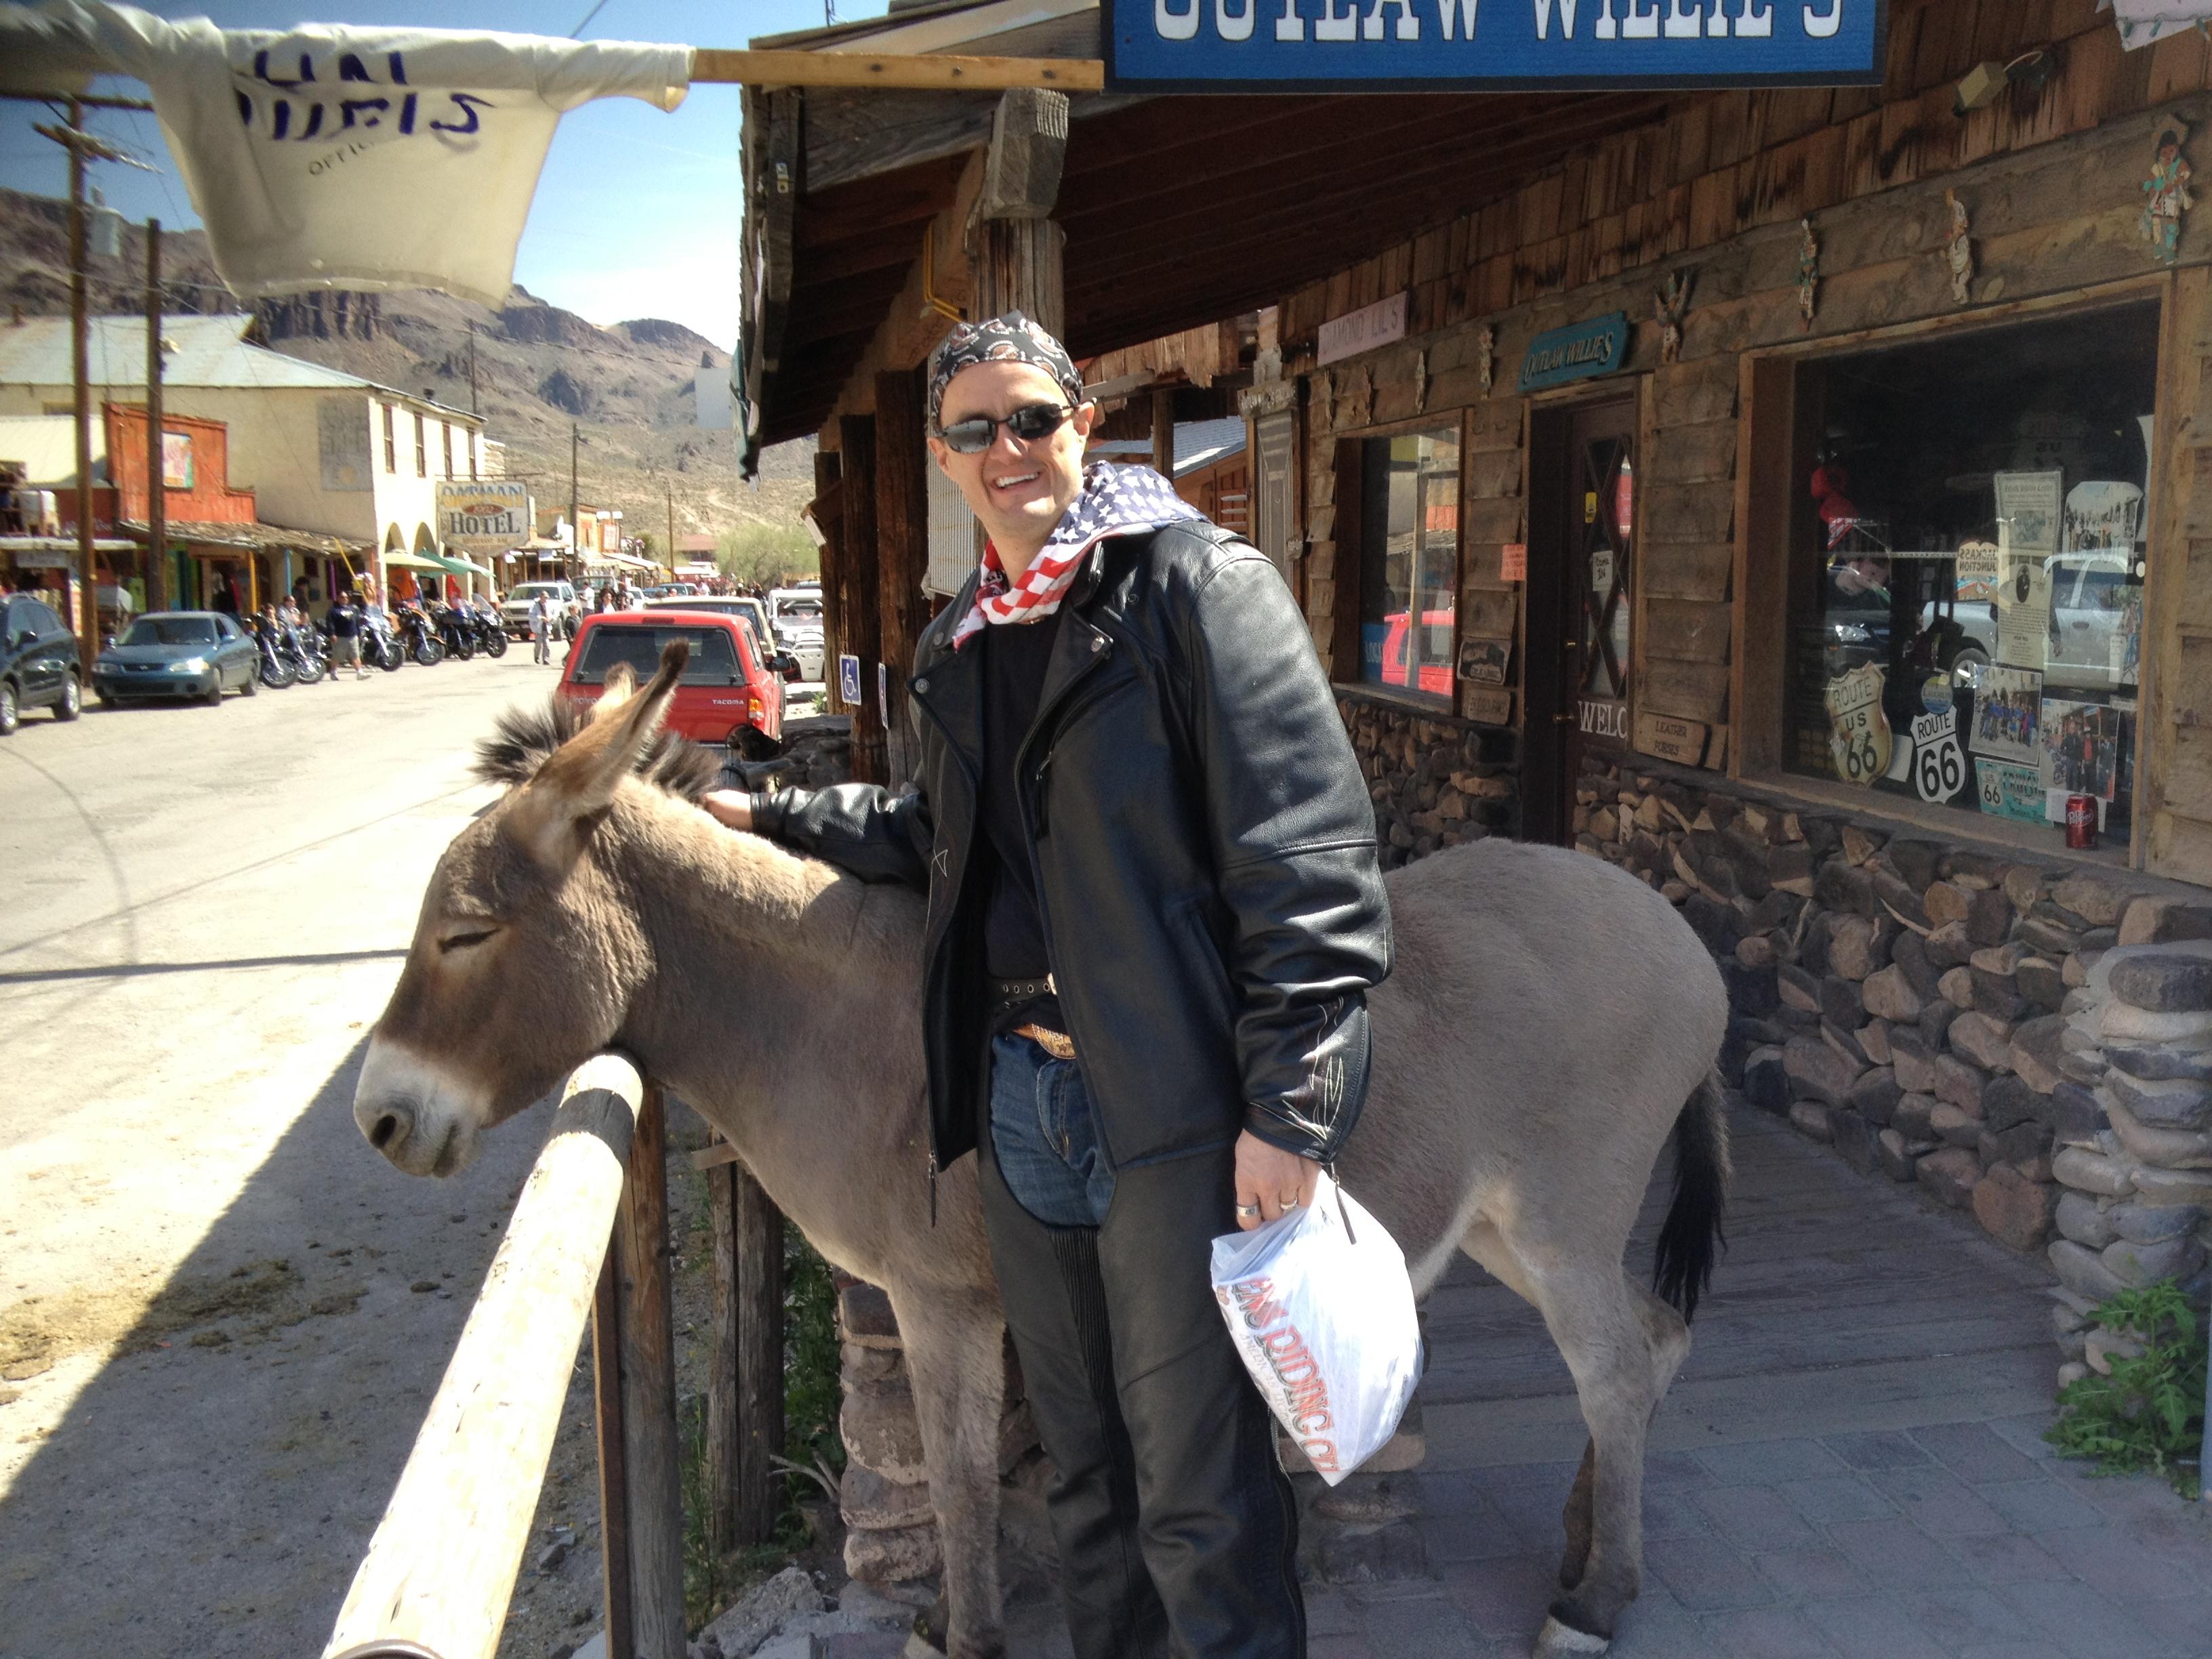 Gary Fales at Oatman, Arizona